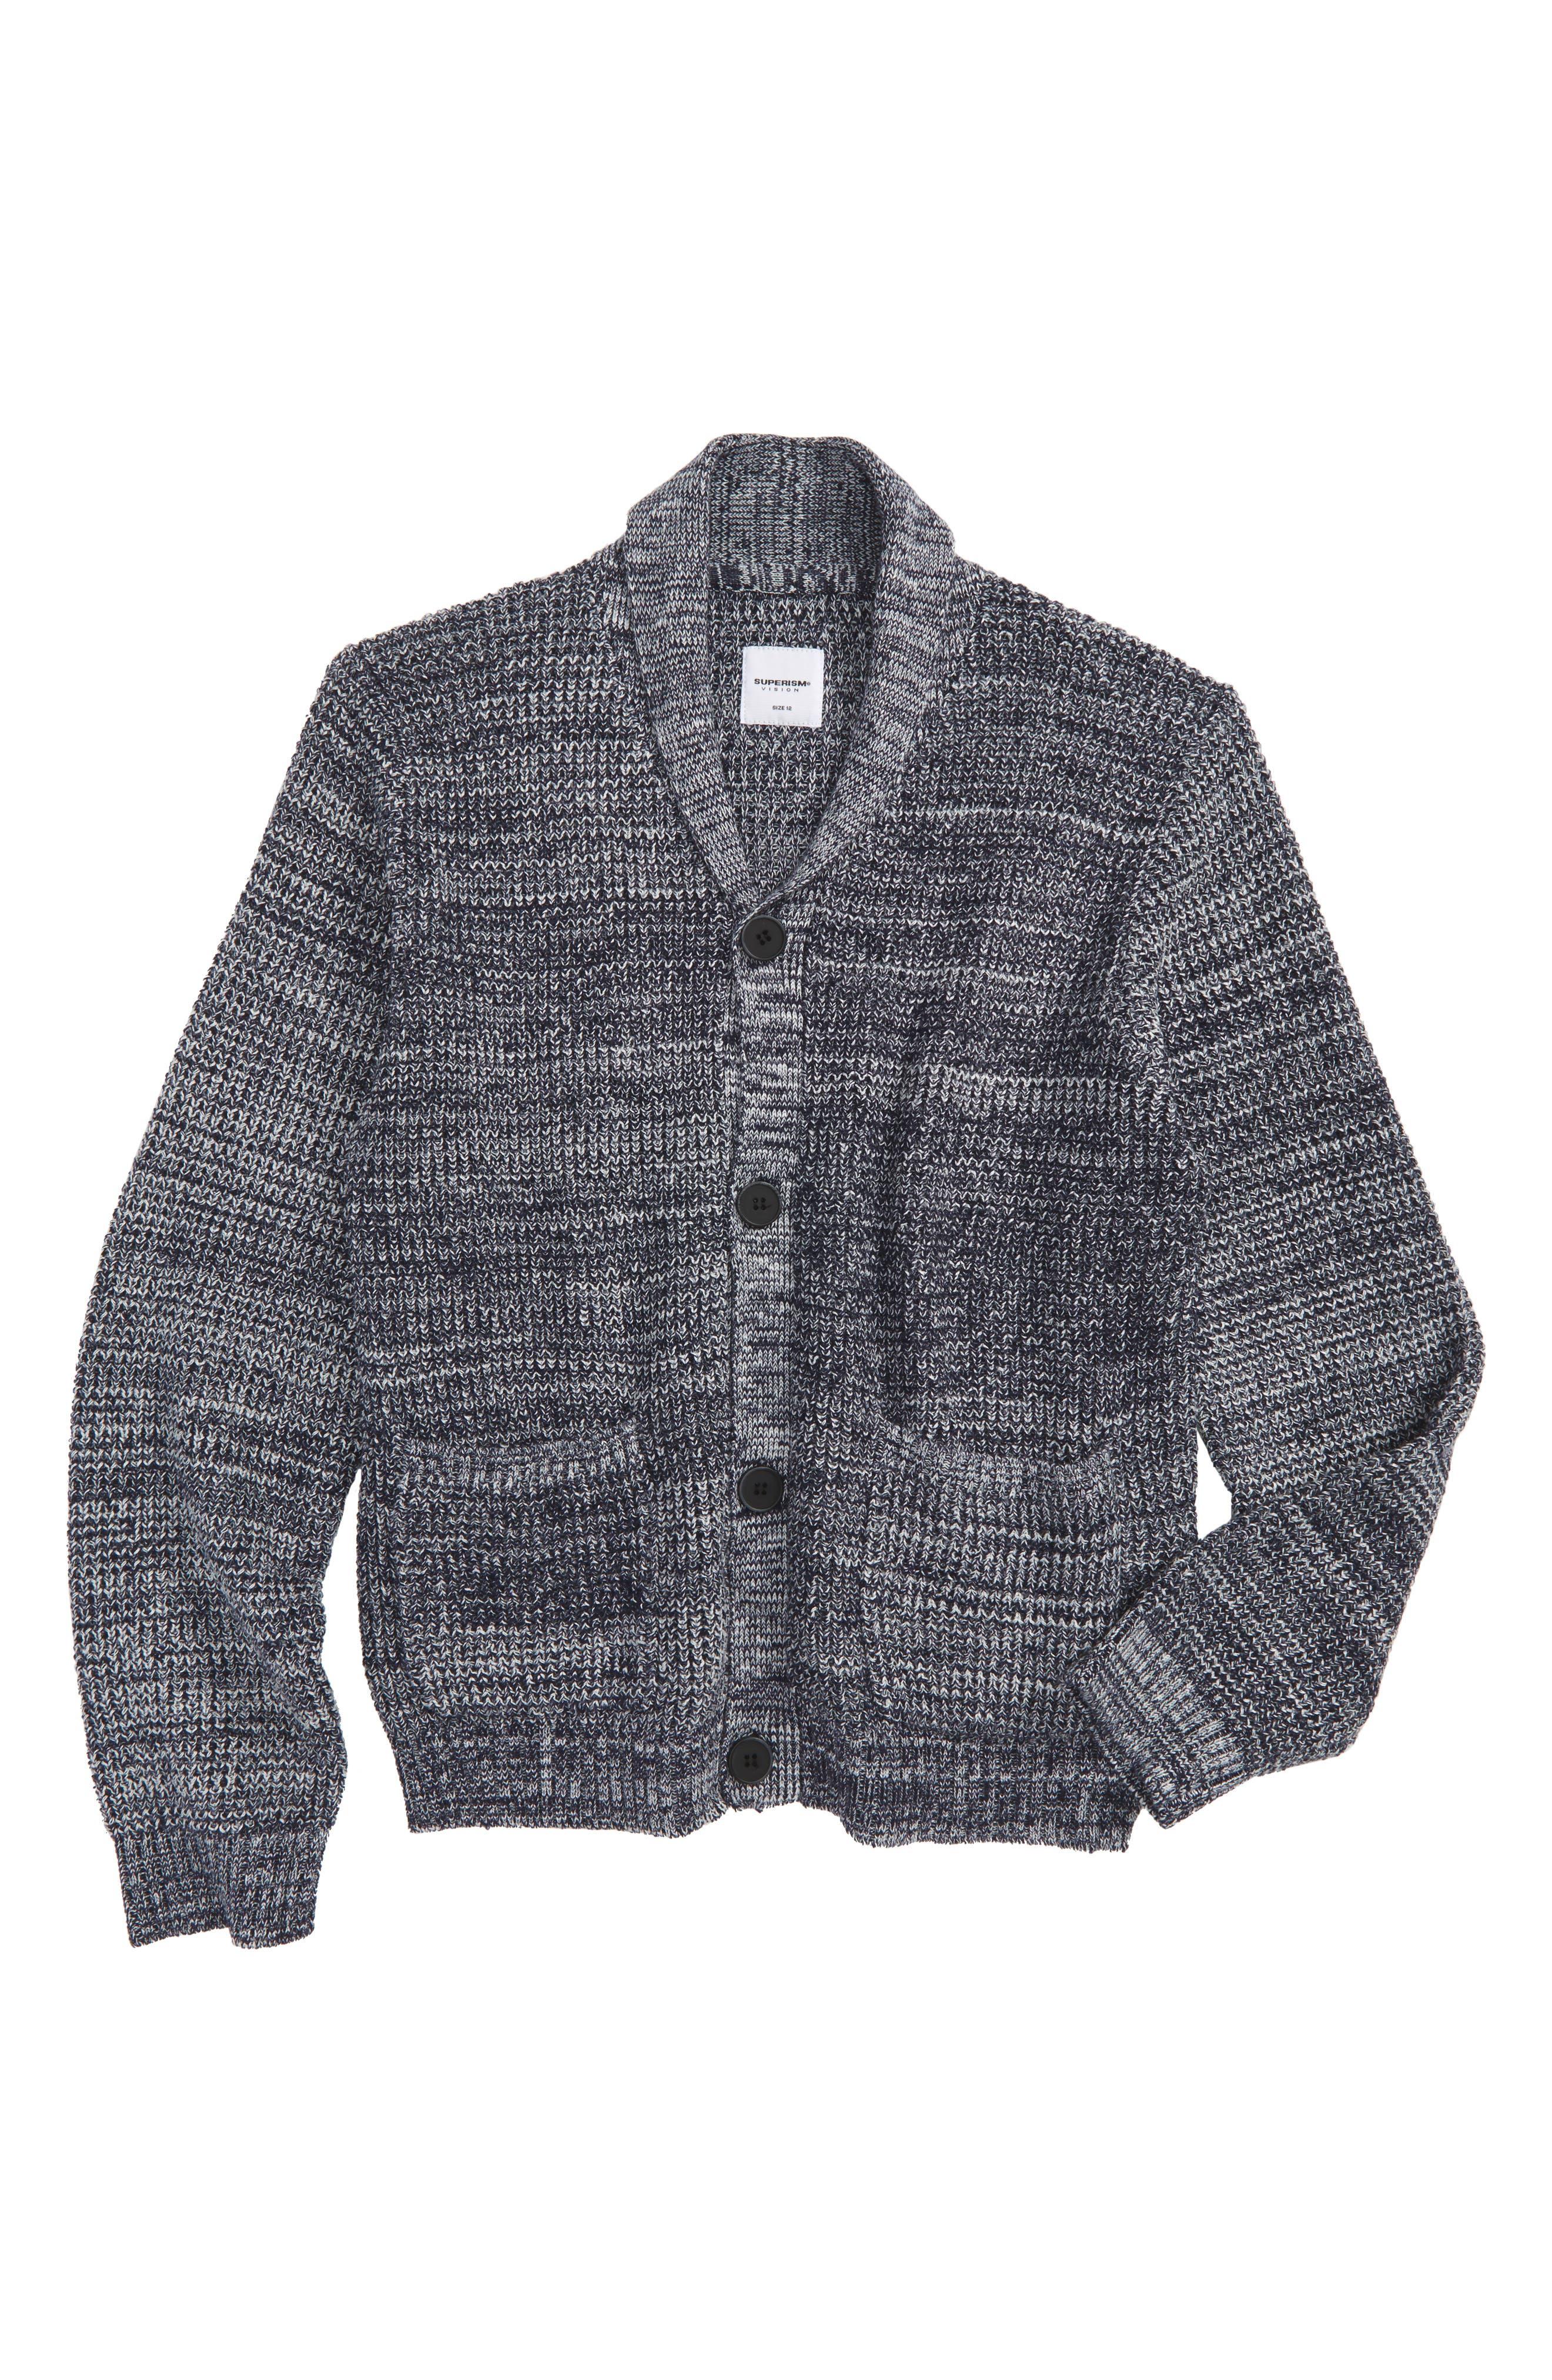 Main Image - Superism Cruz Cardigan Sweater (Big Boys)